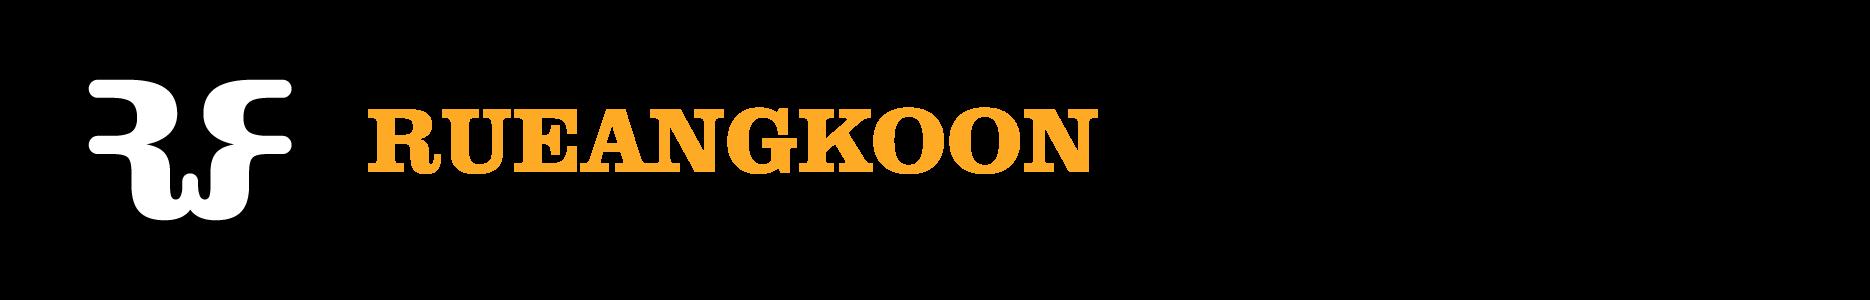 Rueangkoon